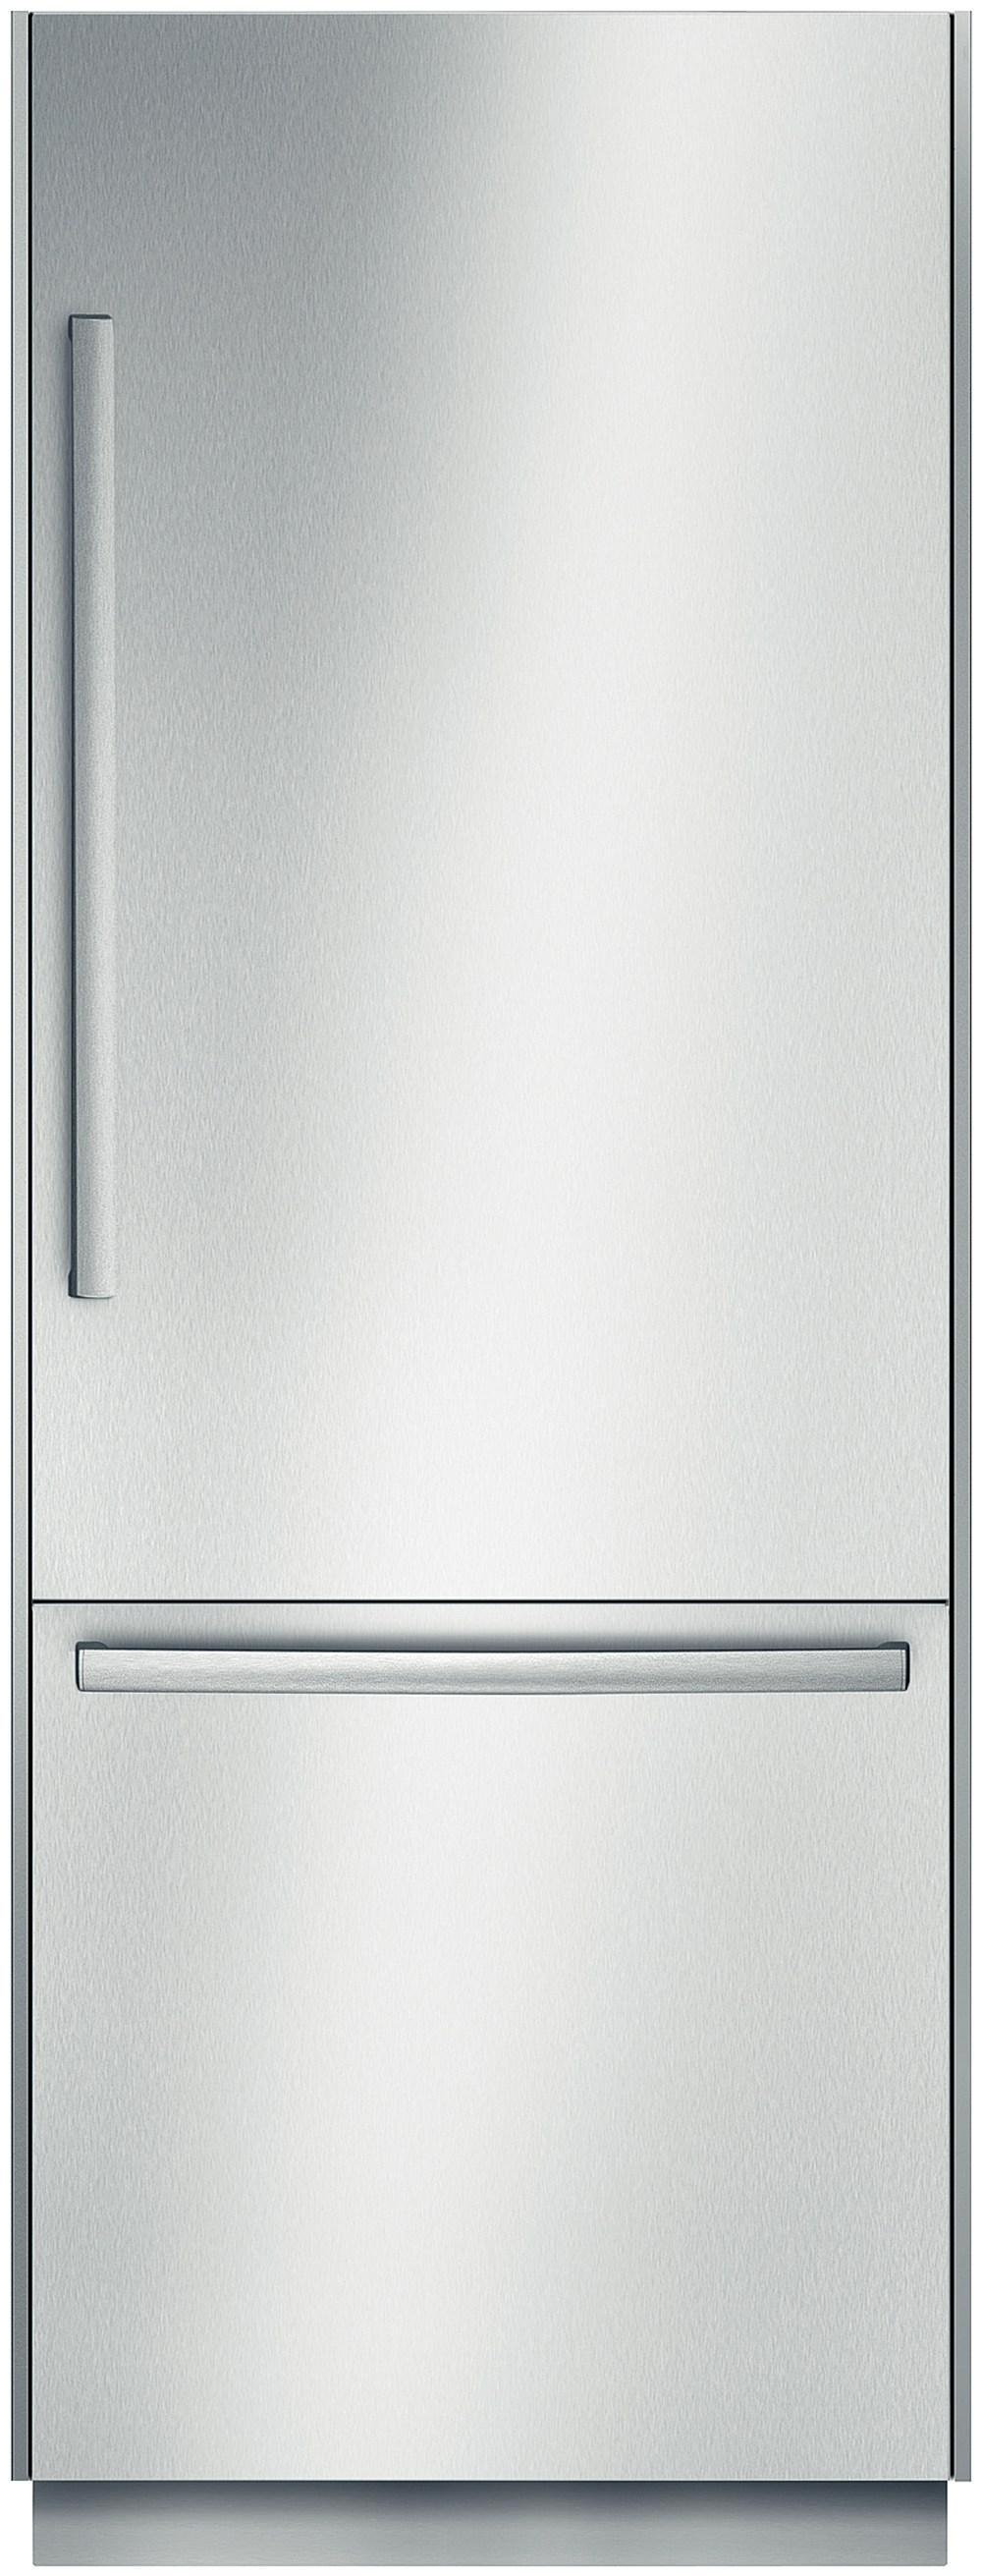 Bosch Bottom-Freezer Refrigerators 16 Cu. Ft. Built-In Bottom-Freezer Refrigera - Item Number: B30BB830SS